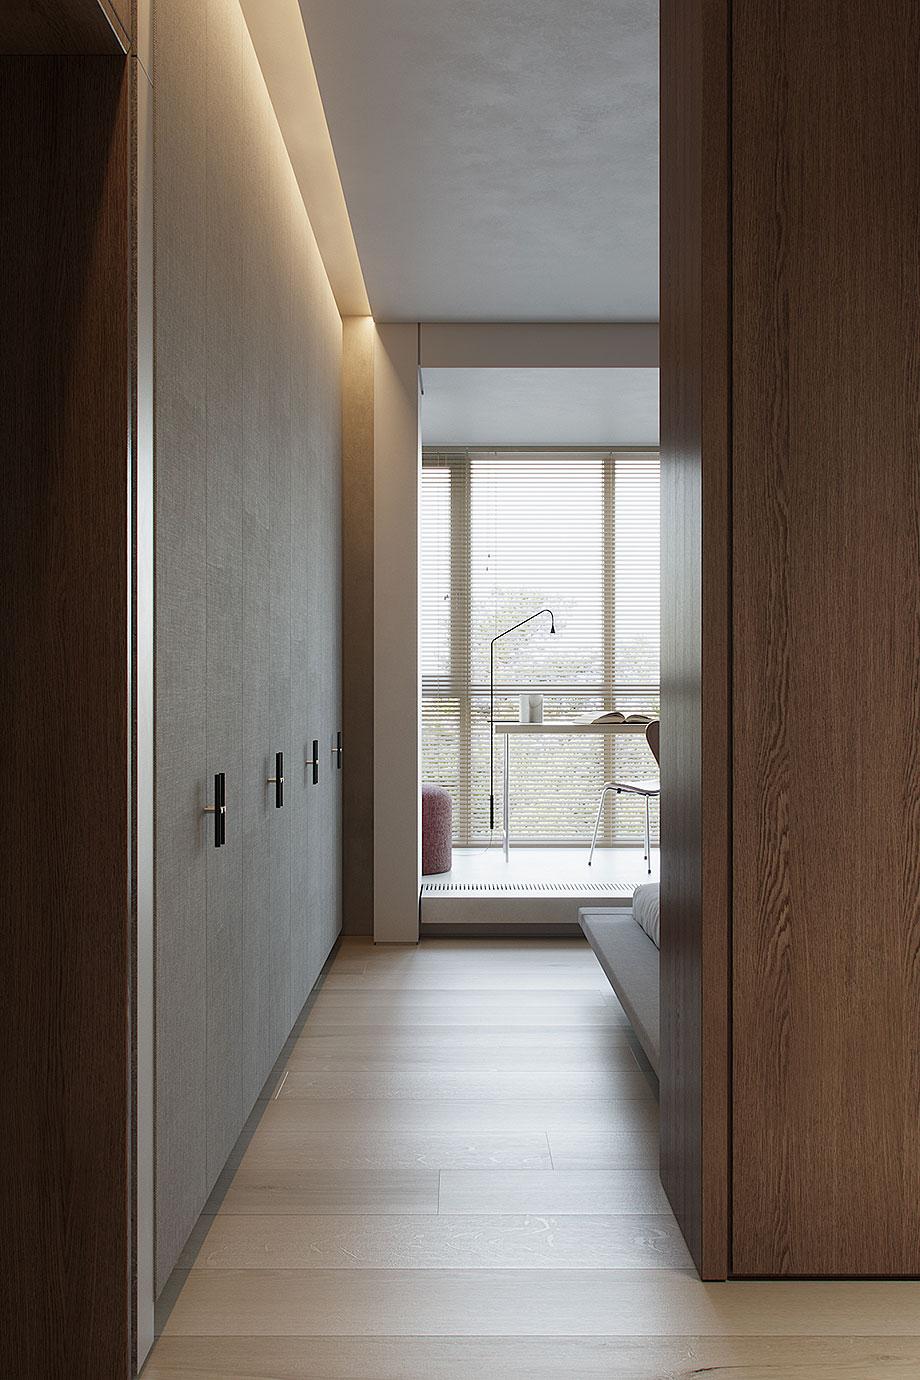 apartamento en moscu de kodd bureau (16) - foto daria koloskova